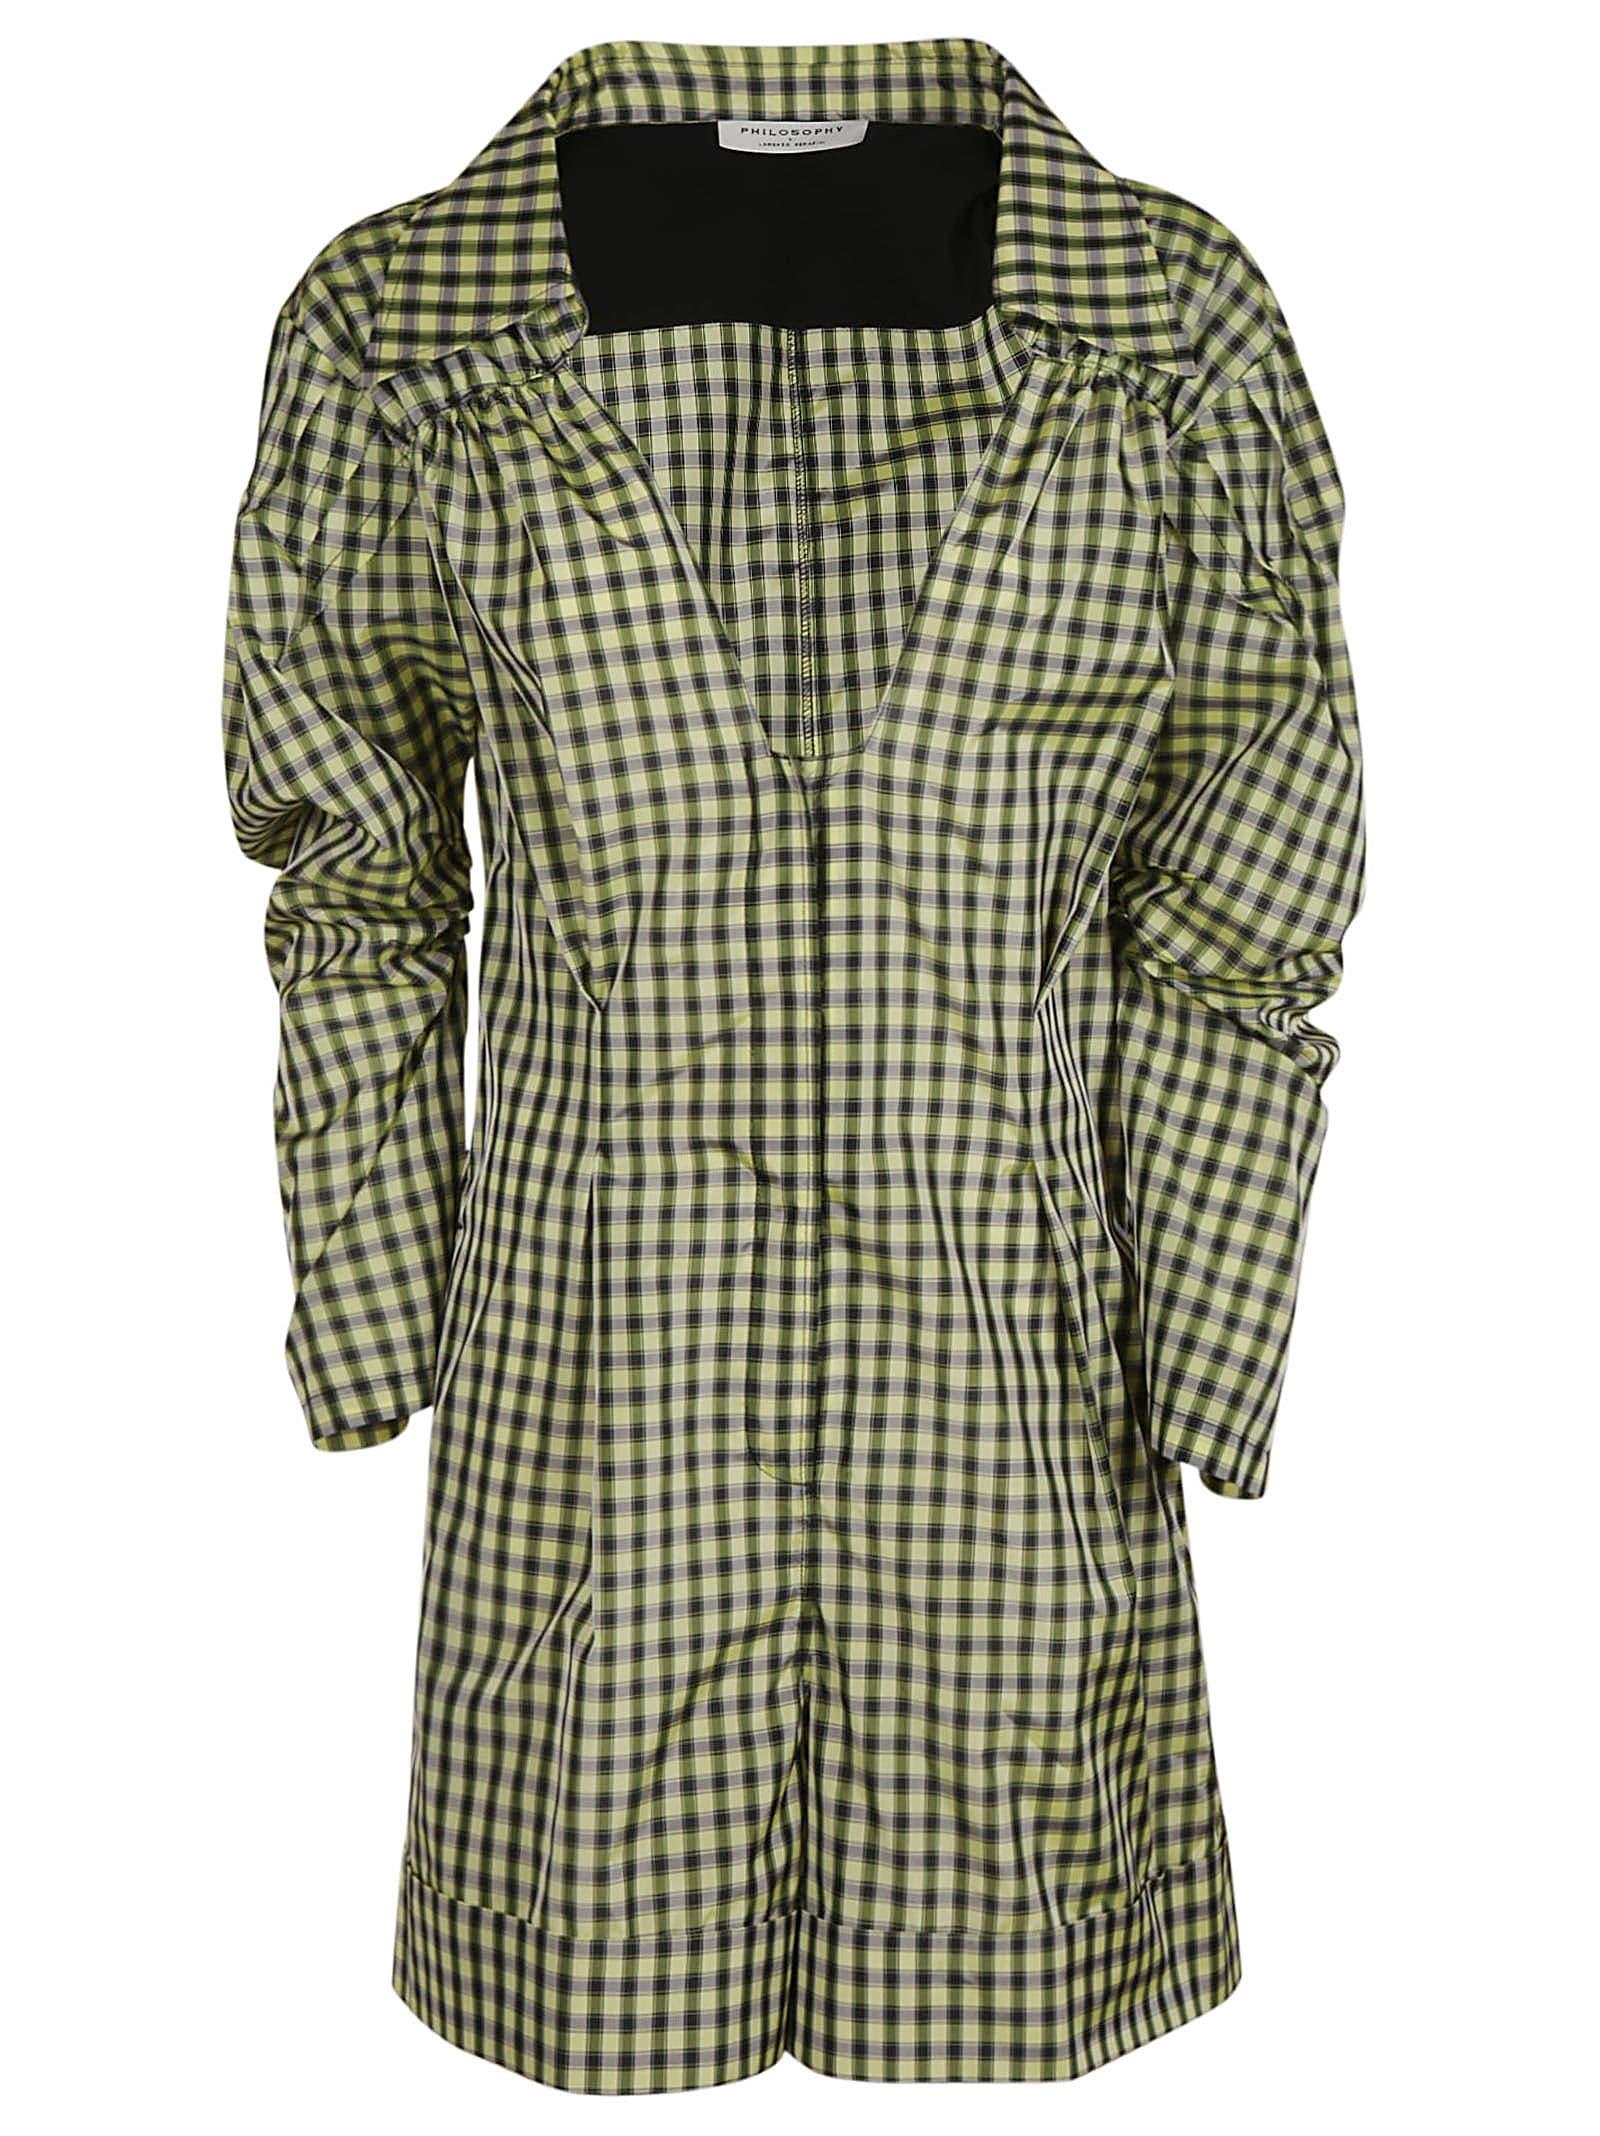 Buy Philosophy di Lorenzo Serafini V-neck Checked Dress online, shop Philosophy di Lorenzo Serafini with free shipping